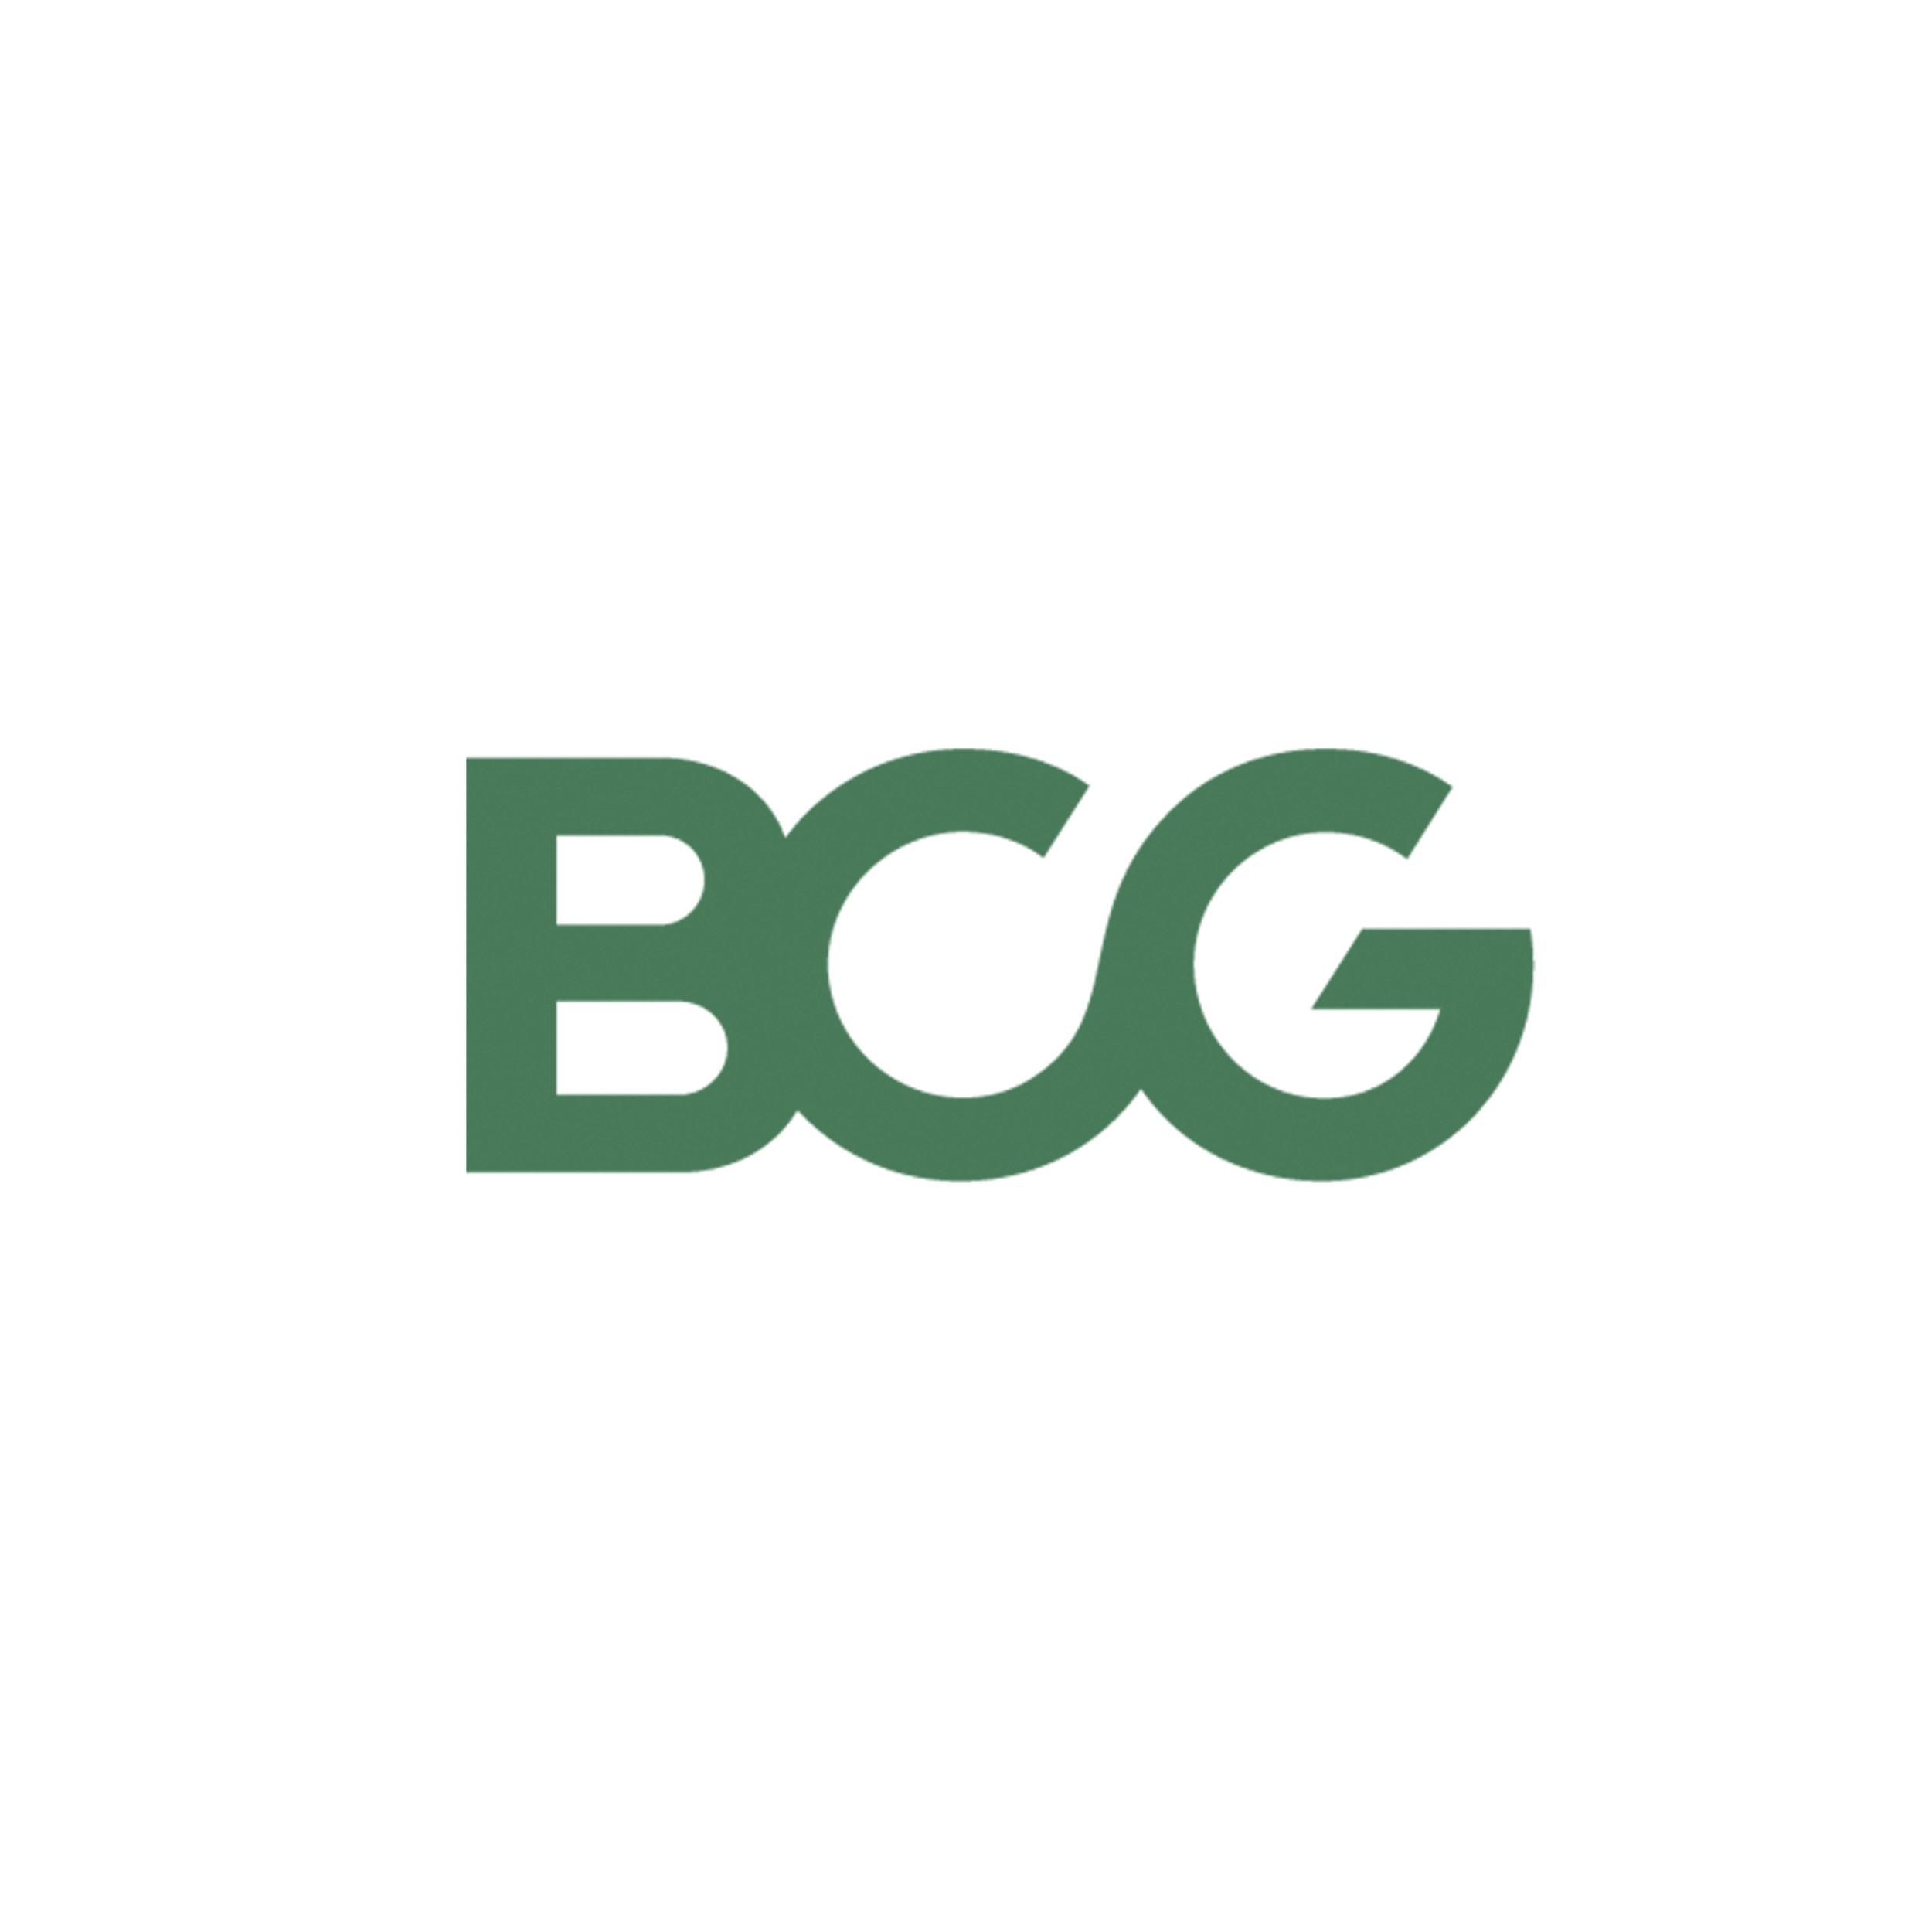 SS BCG.jpg